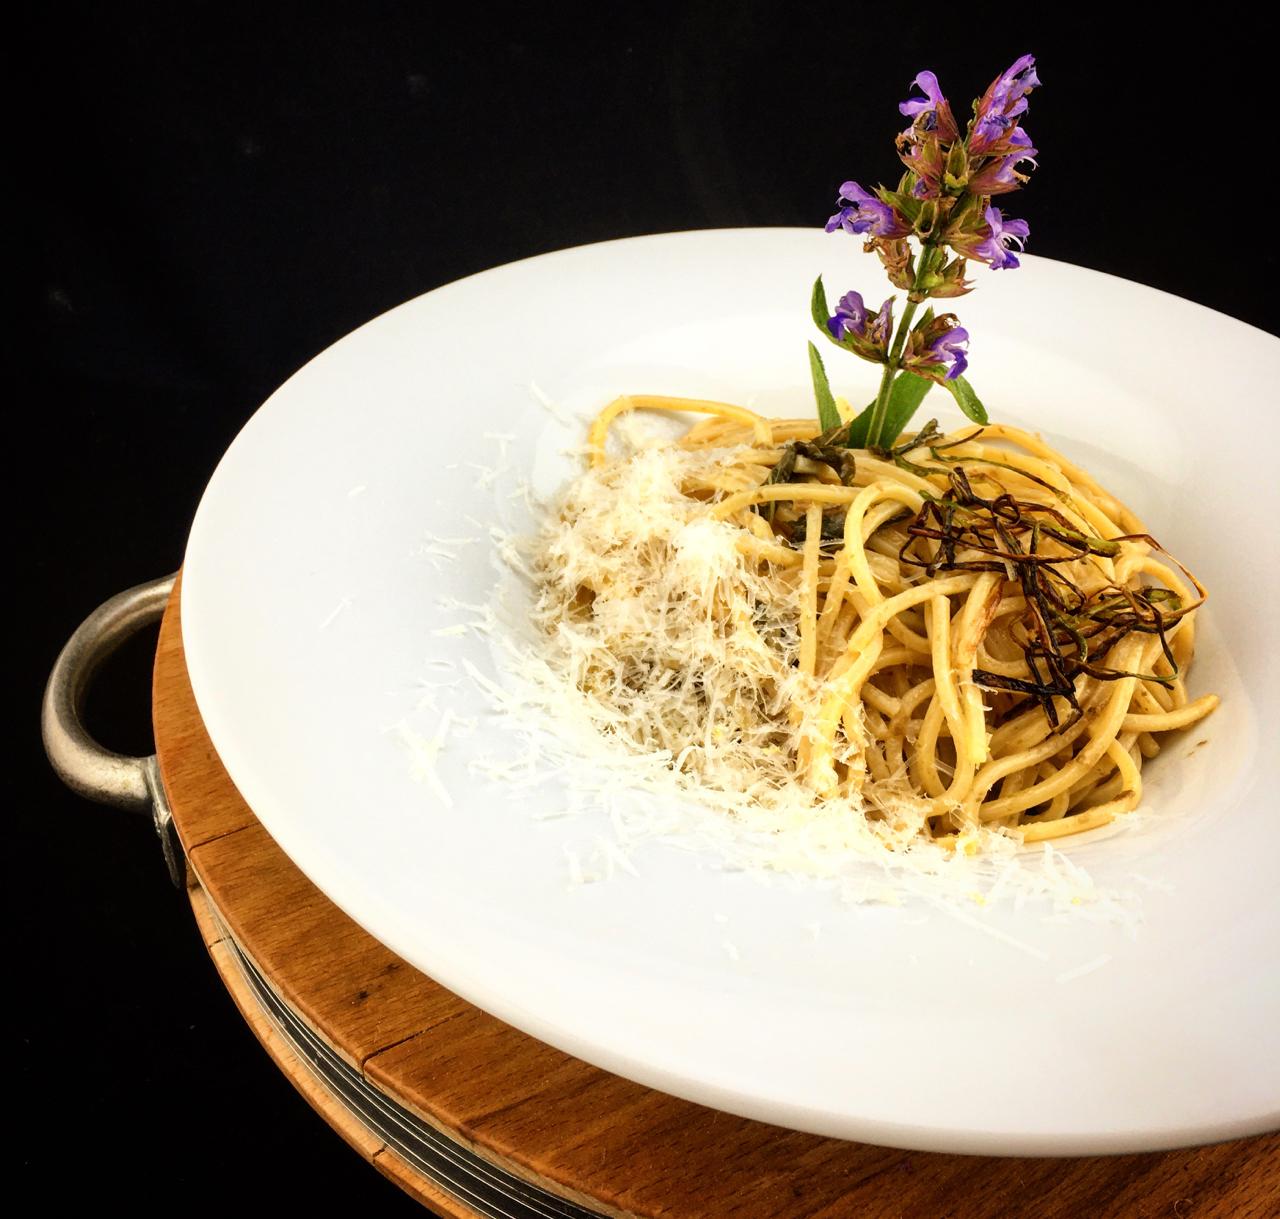 Spaghetti mit Salbei undKapern